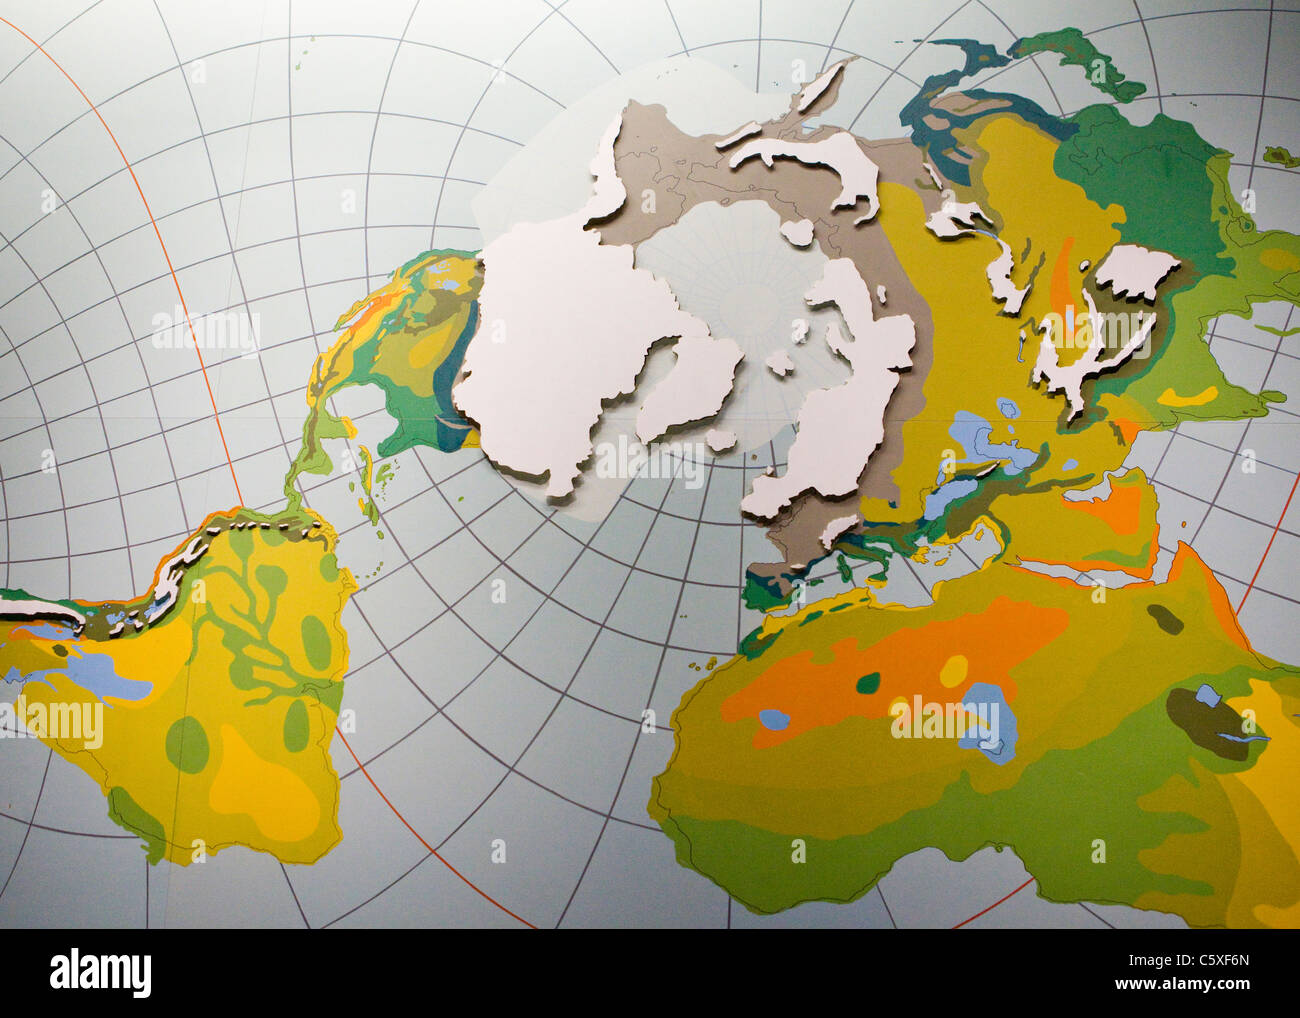 northern hemisphere map stock photos northern hemisphere map